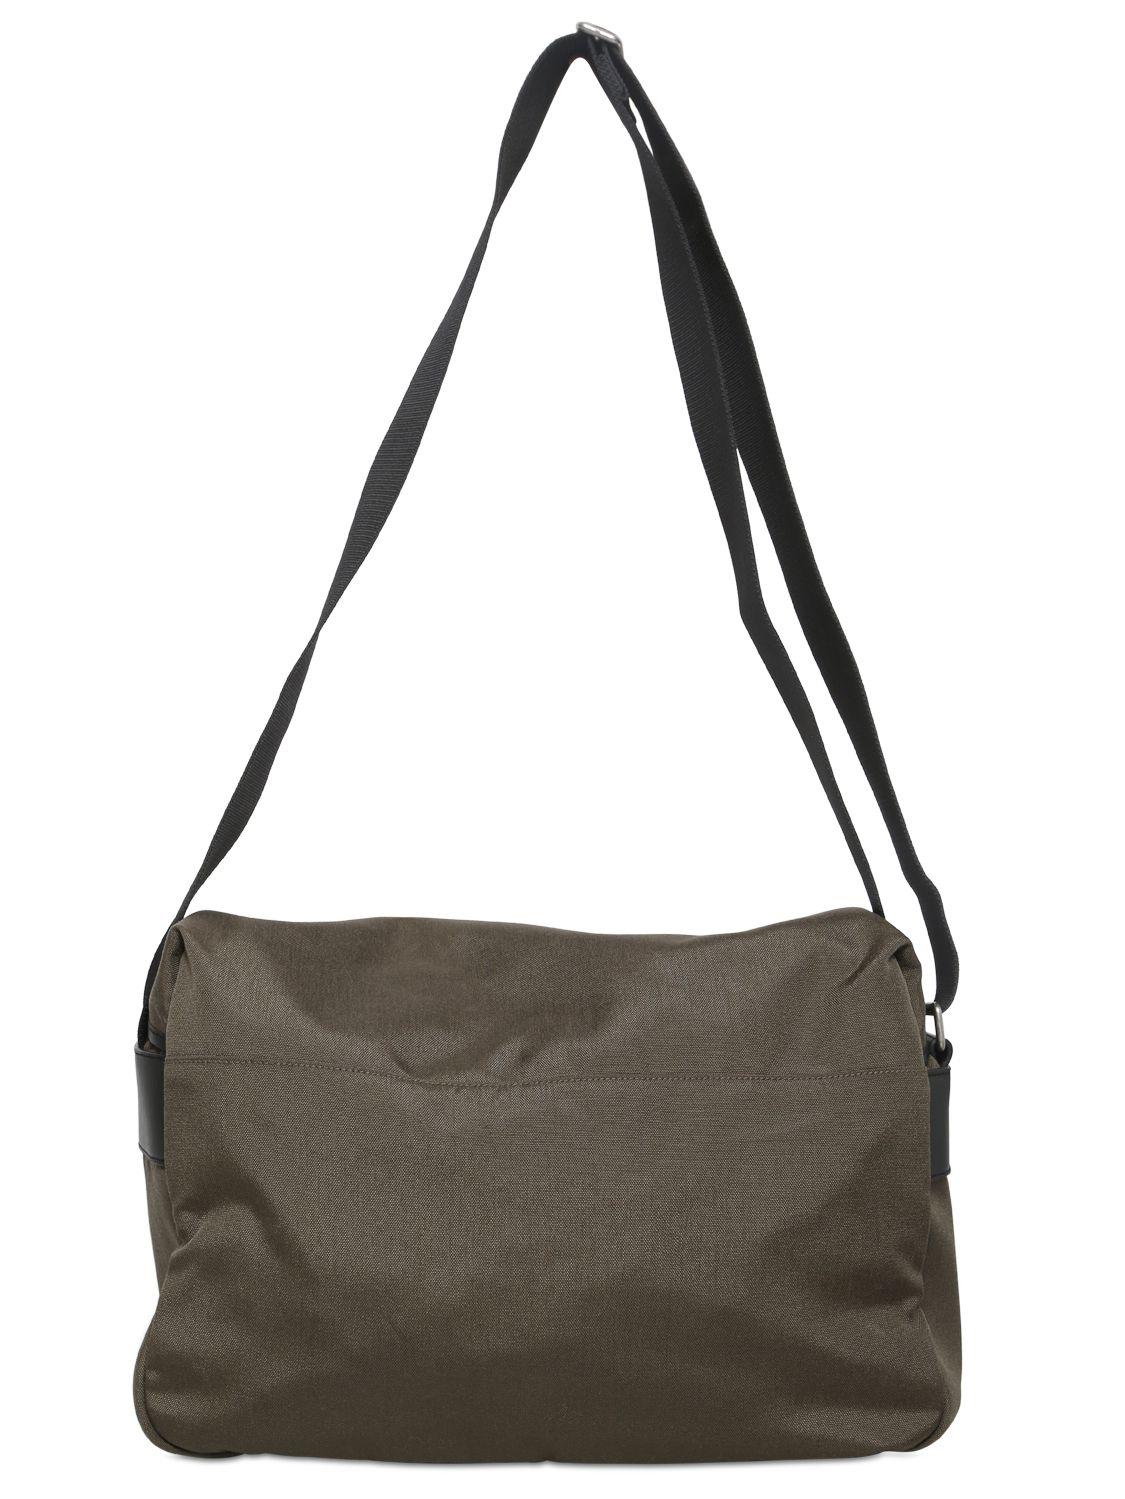 40a63b362f Lyst - Saint Laurent Hunting Nylon Canvas Messenger Bag in Green for Men